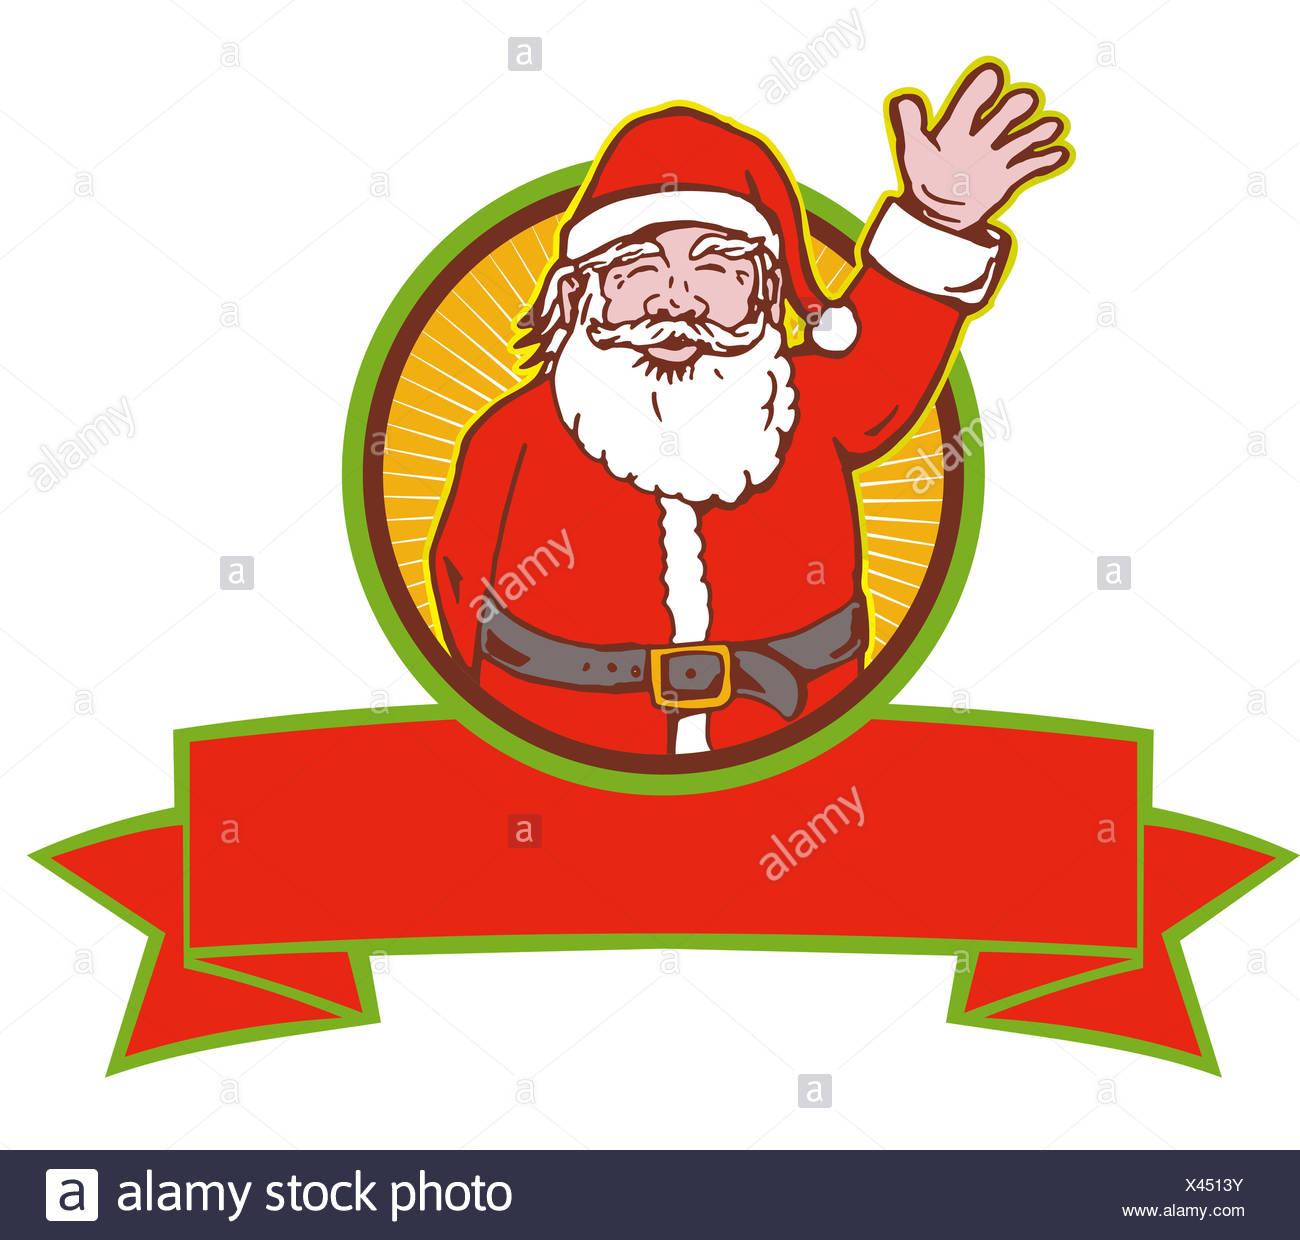 Father Christmas Cartoon Images.Santa Claus Father Christmas Cartoon Stock Photo 277935167